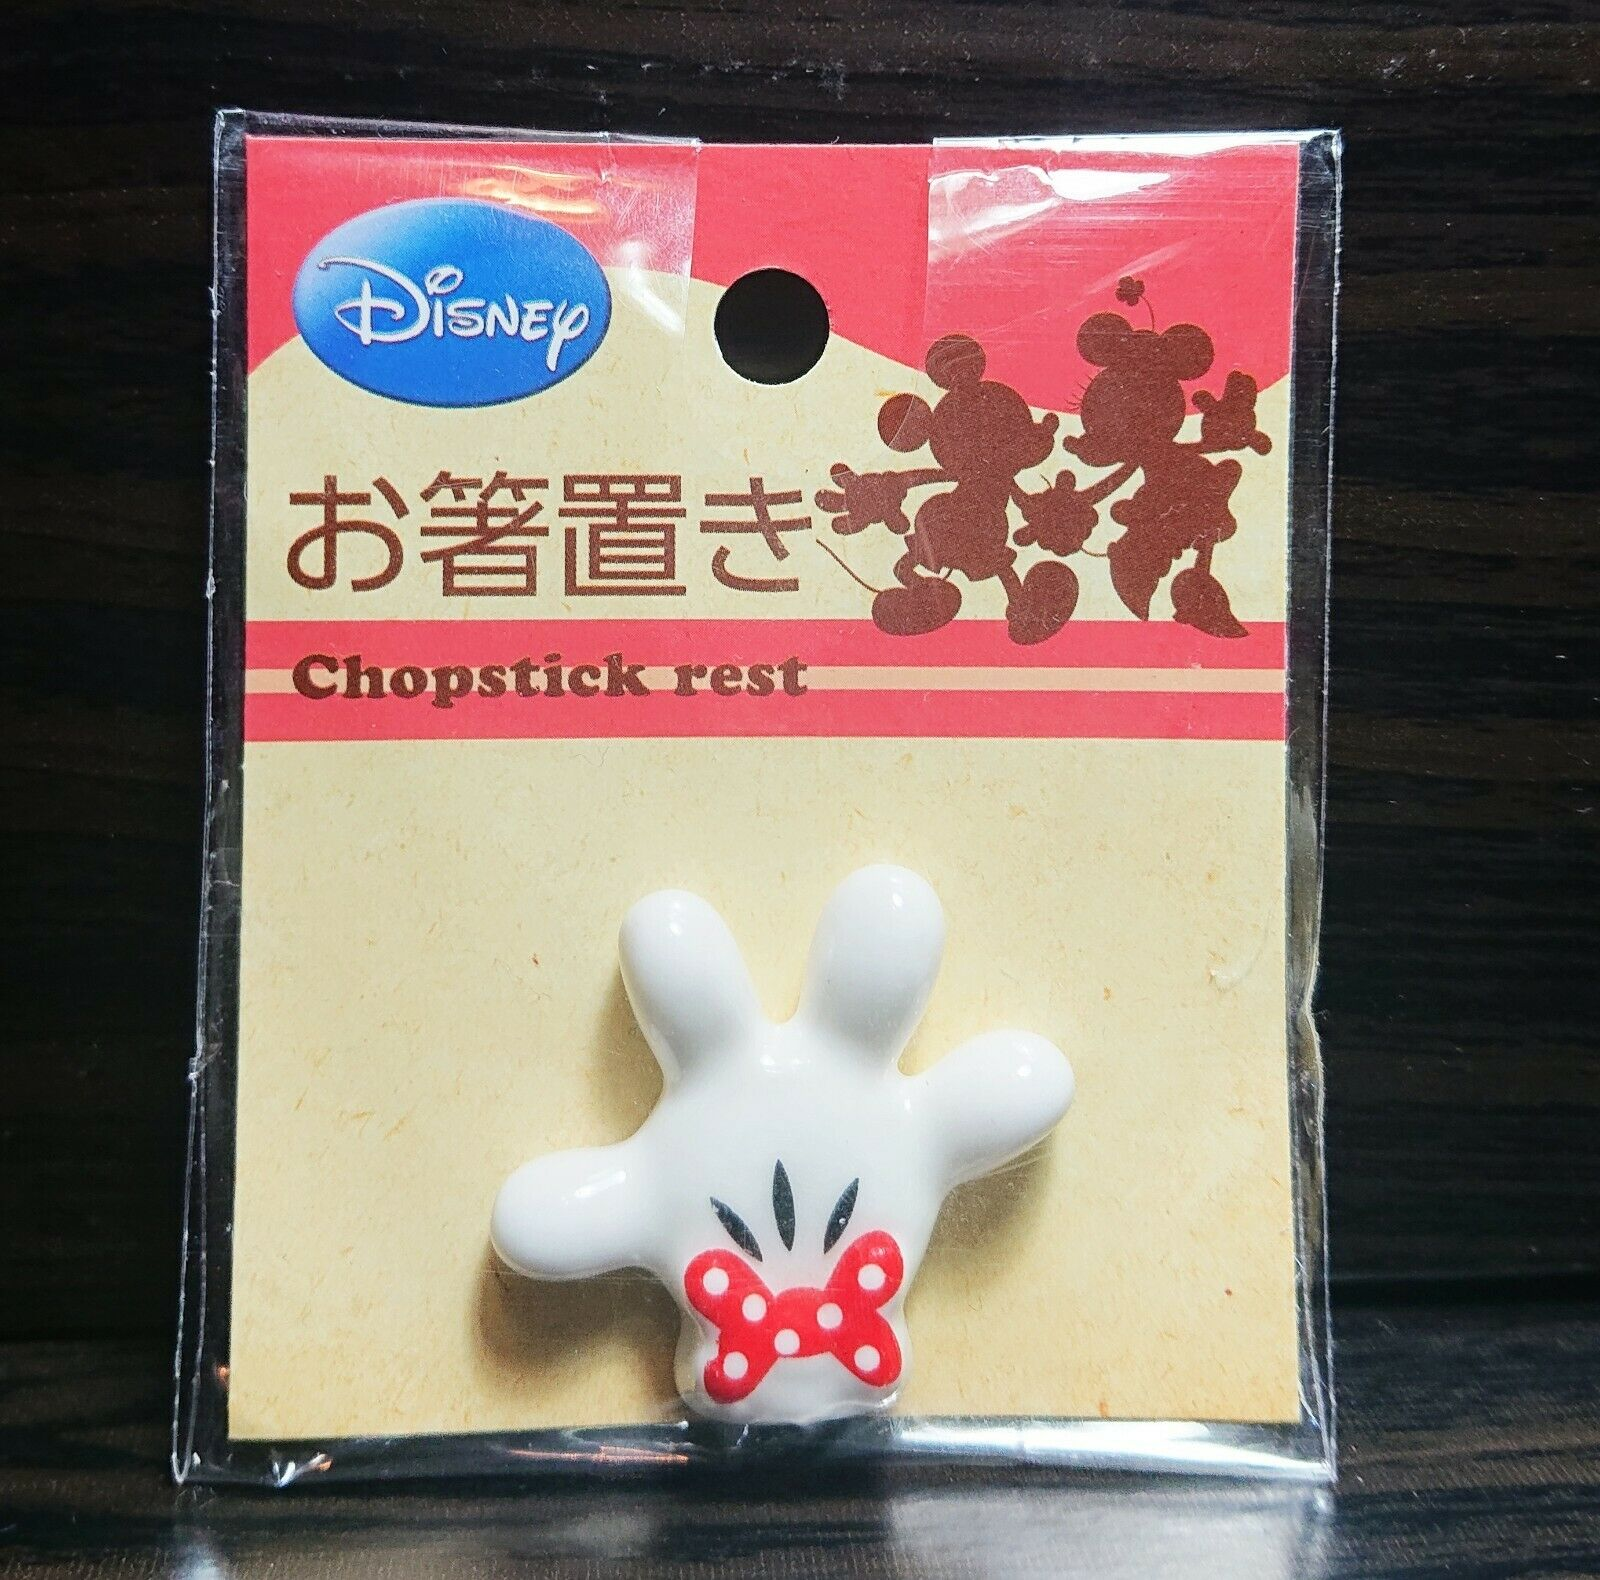 Chopsticks Assorted Fortune Cookie or Crane Rests or Pink Rabbit Rests